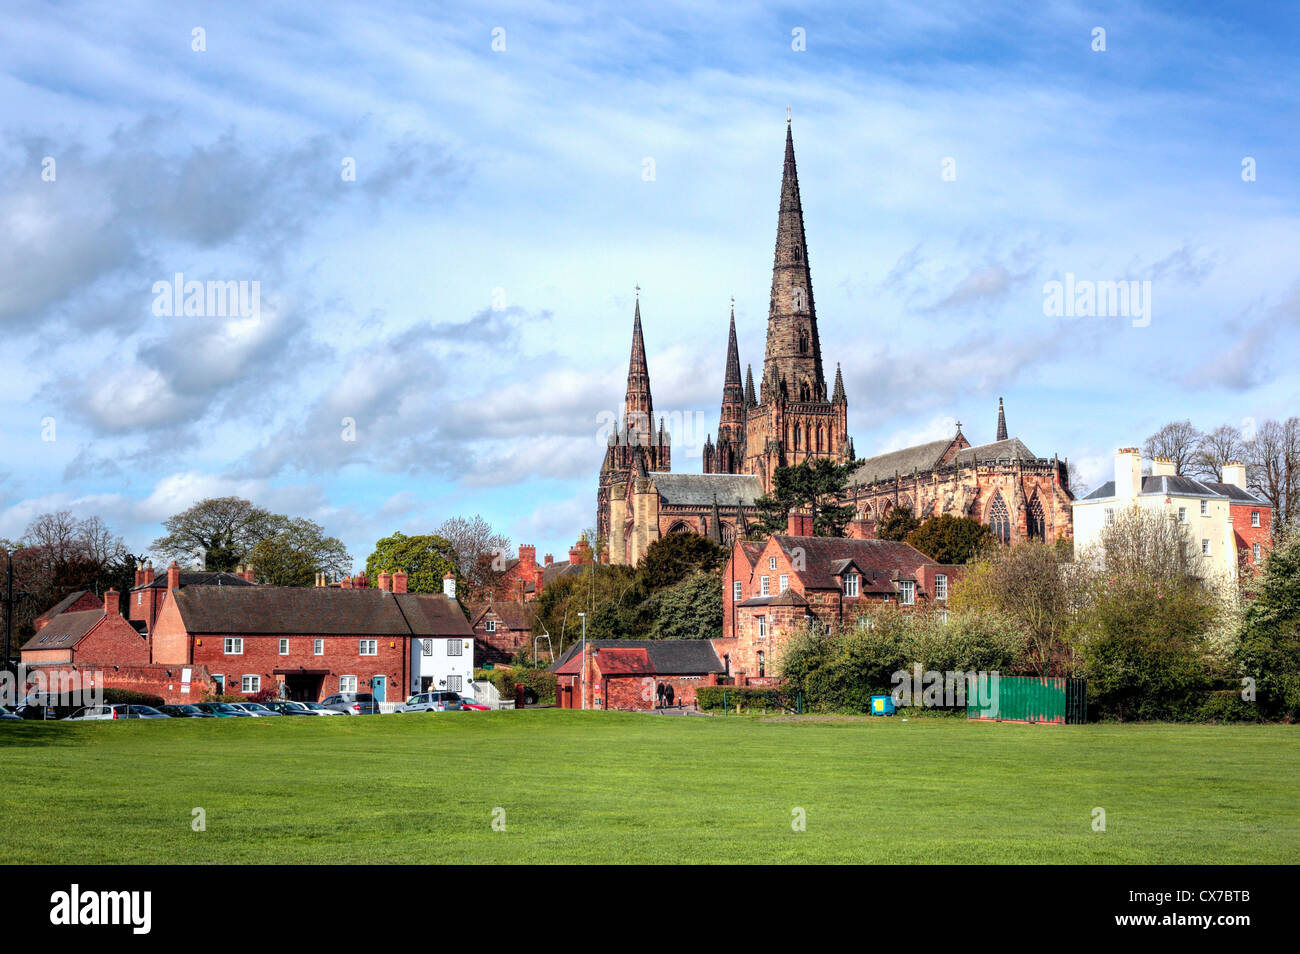 Lichfield Cathedral, Lichfield, Staffordshire, UK - Stock Image